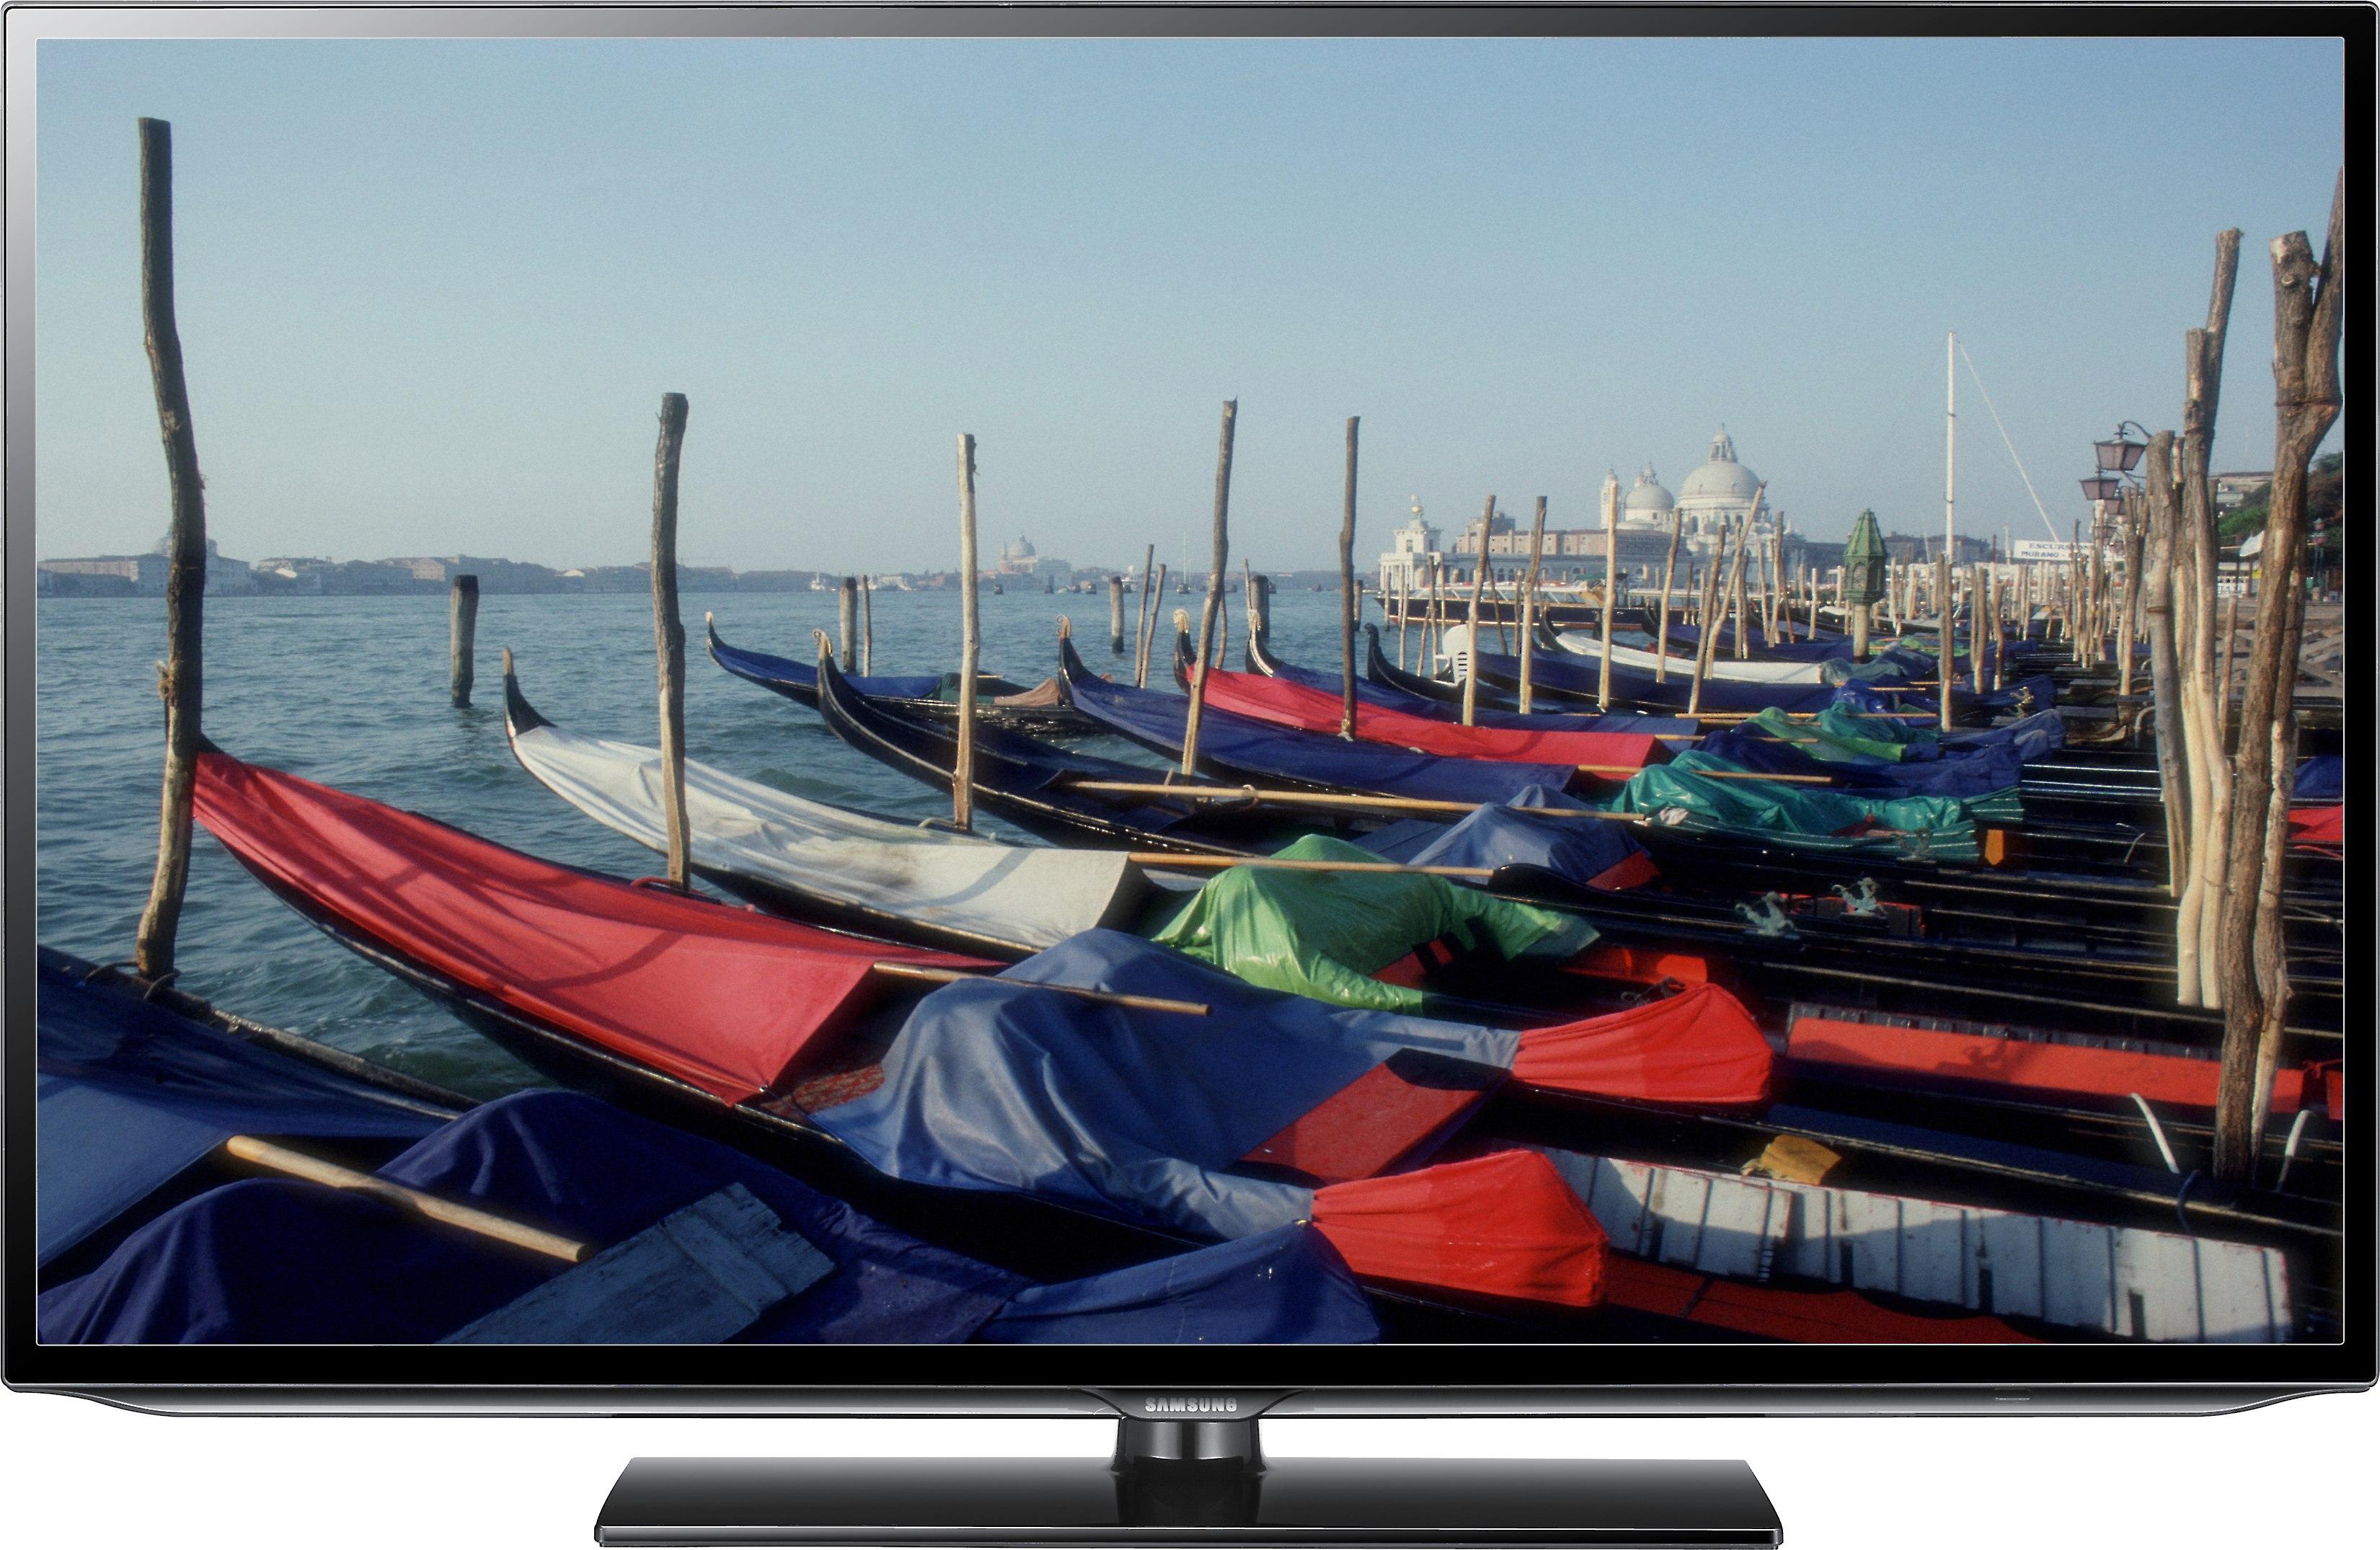 SAMSUNG UN40EH5000F LED TV DRIVER WINDOWS XP